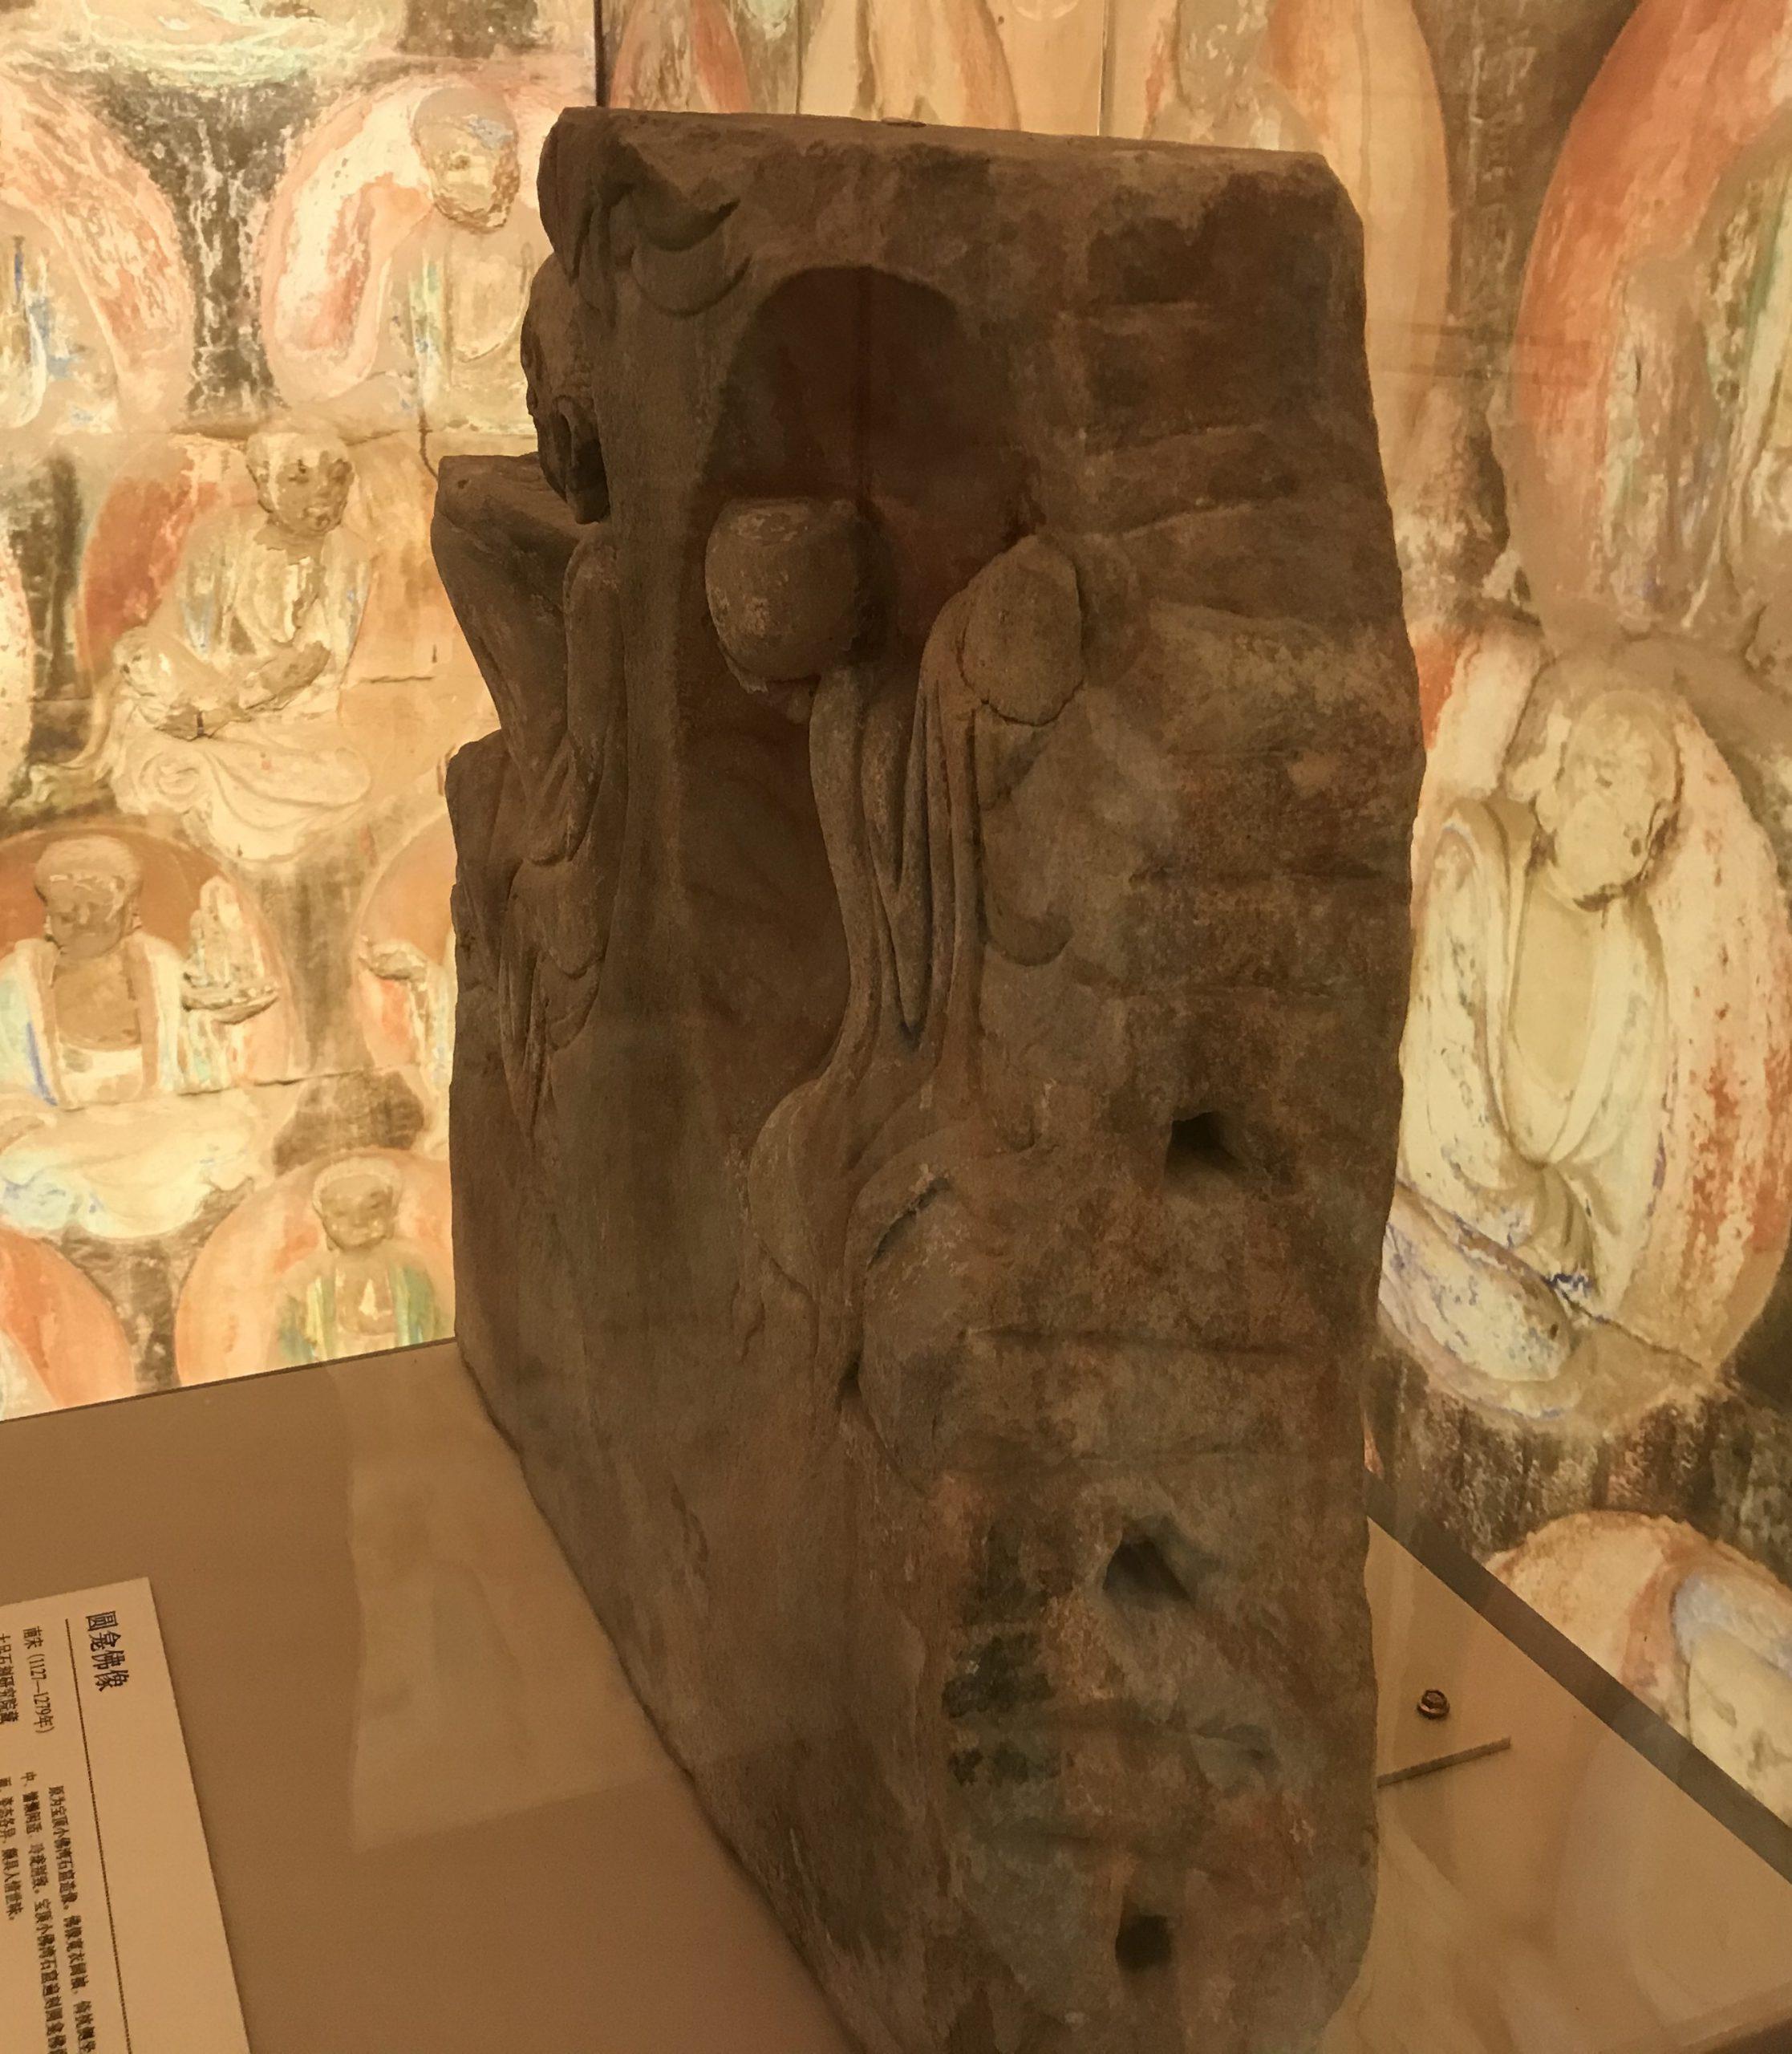 圓龕仏像-南宋-天下の大足-大足石刻の発見と継承-金沙遺跡博物館-成都